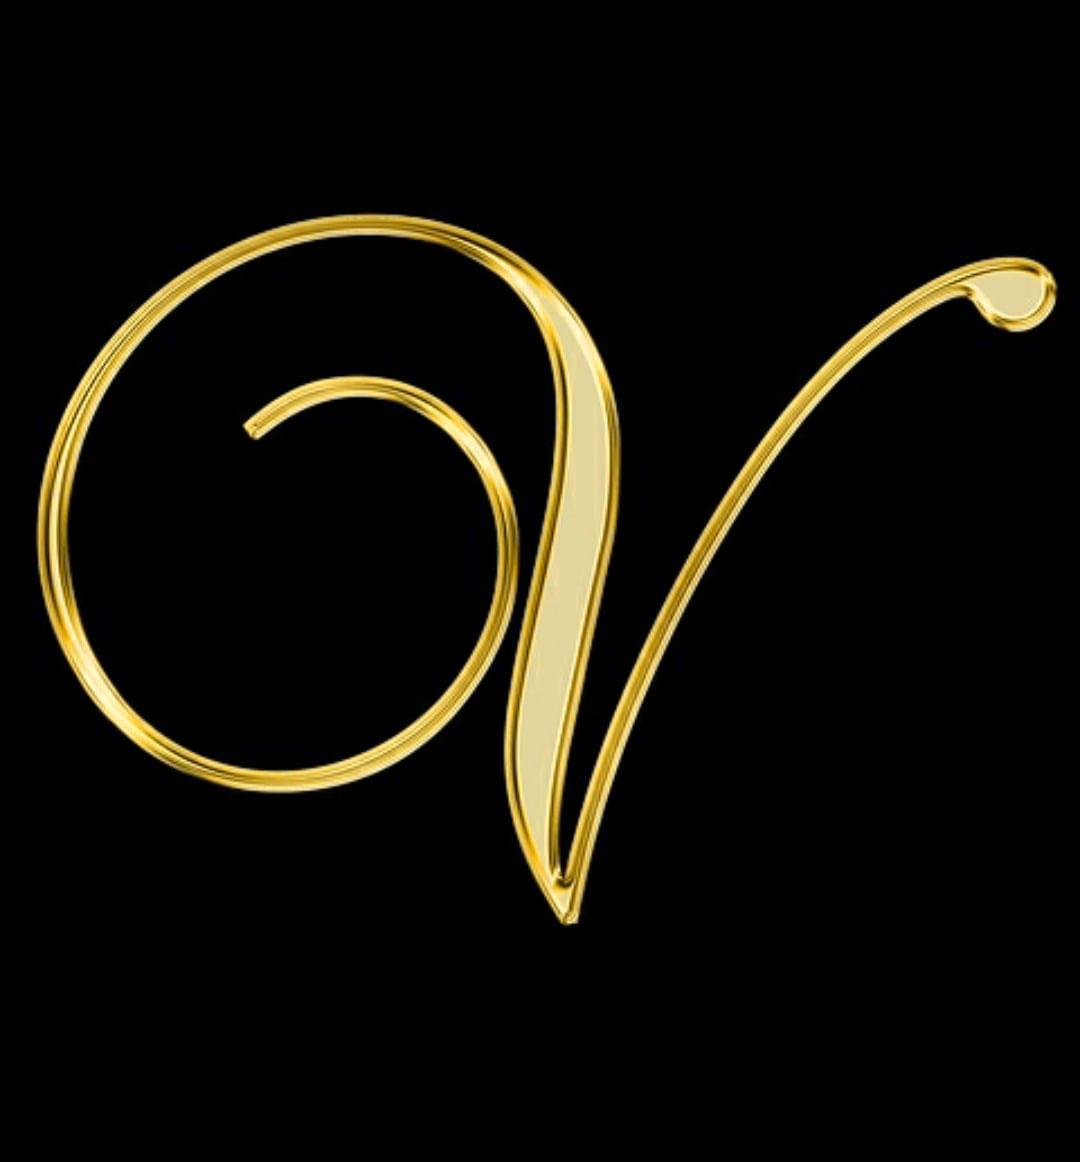 New V Name Dp Images wallpaper photo for download